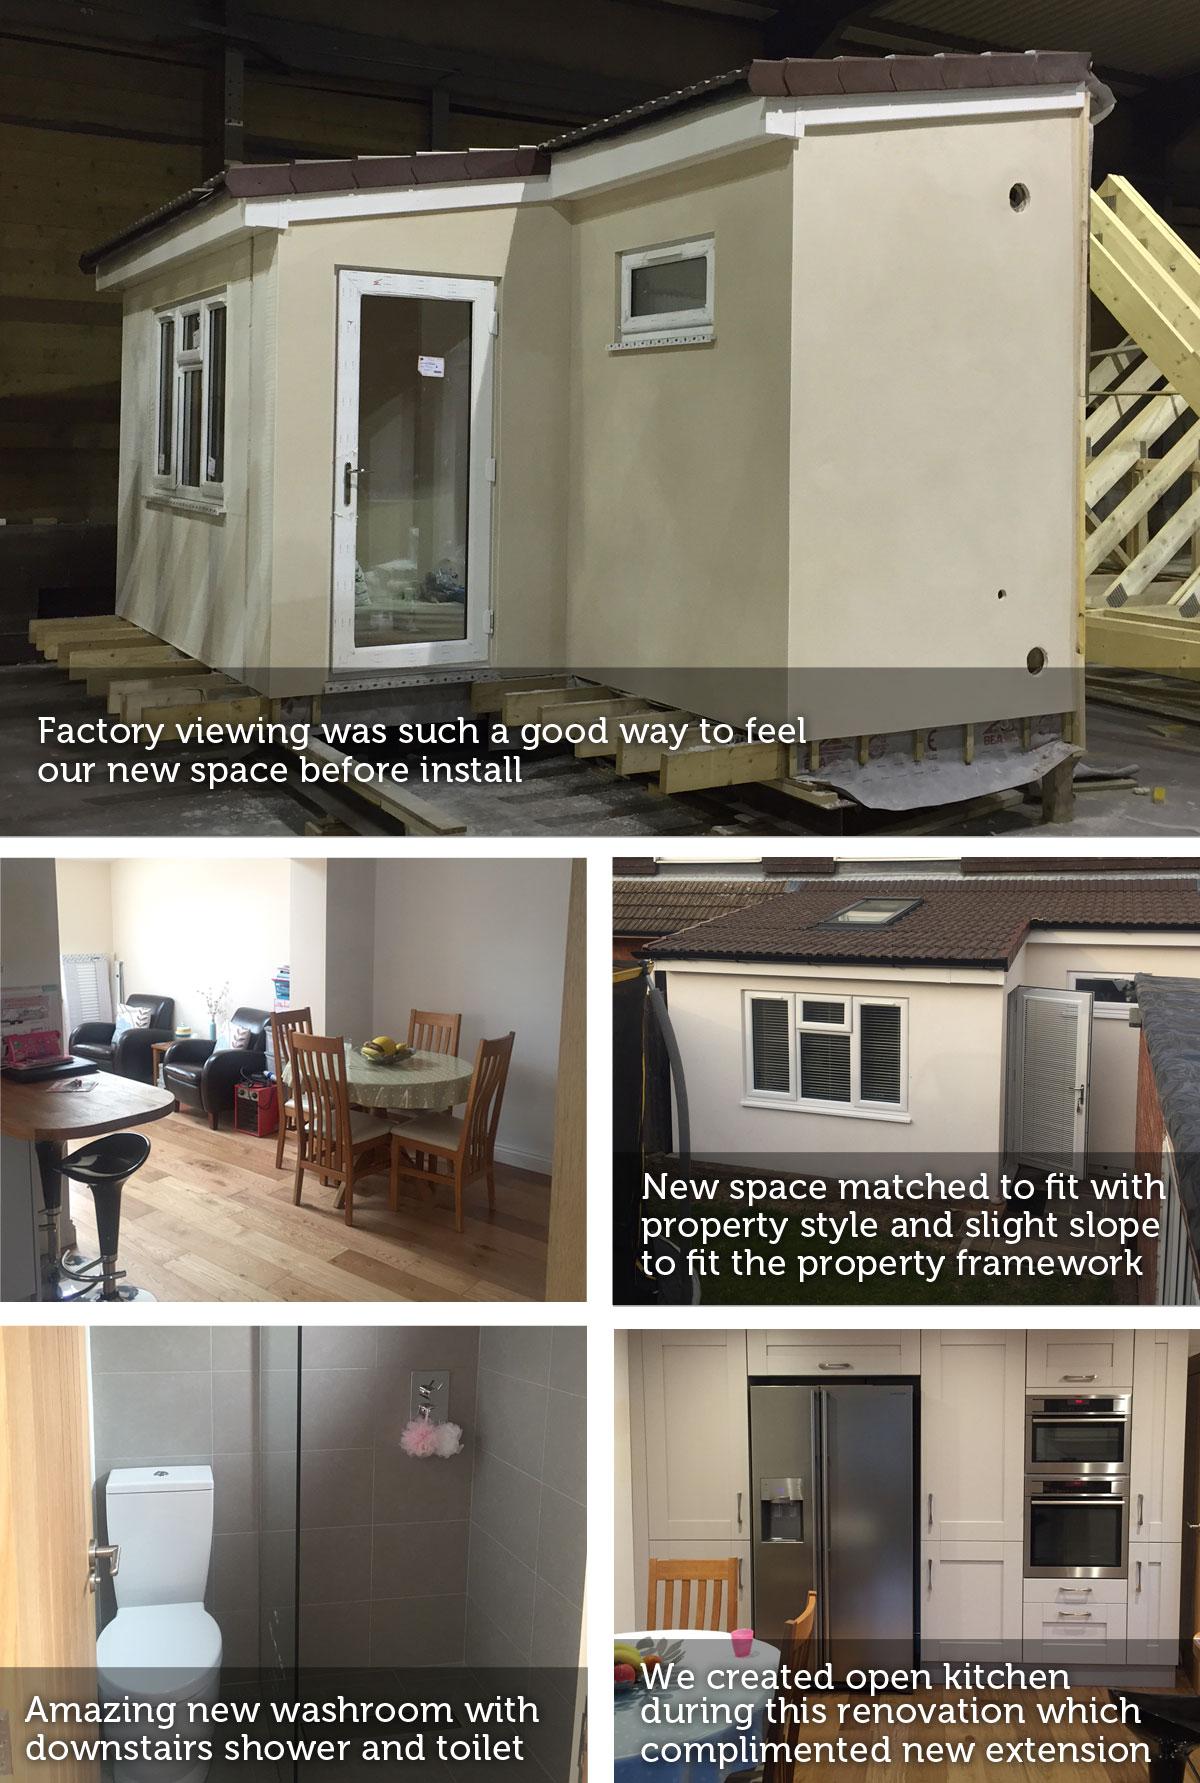 utility-room-montage